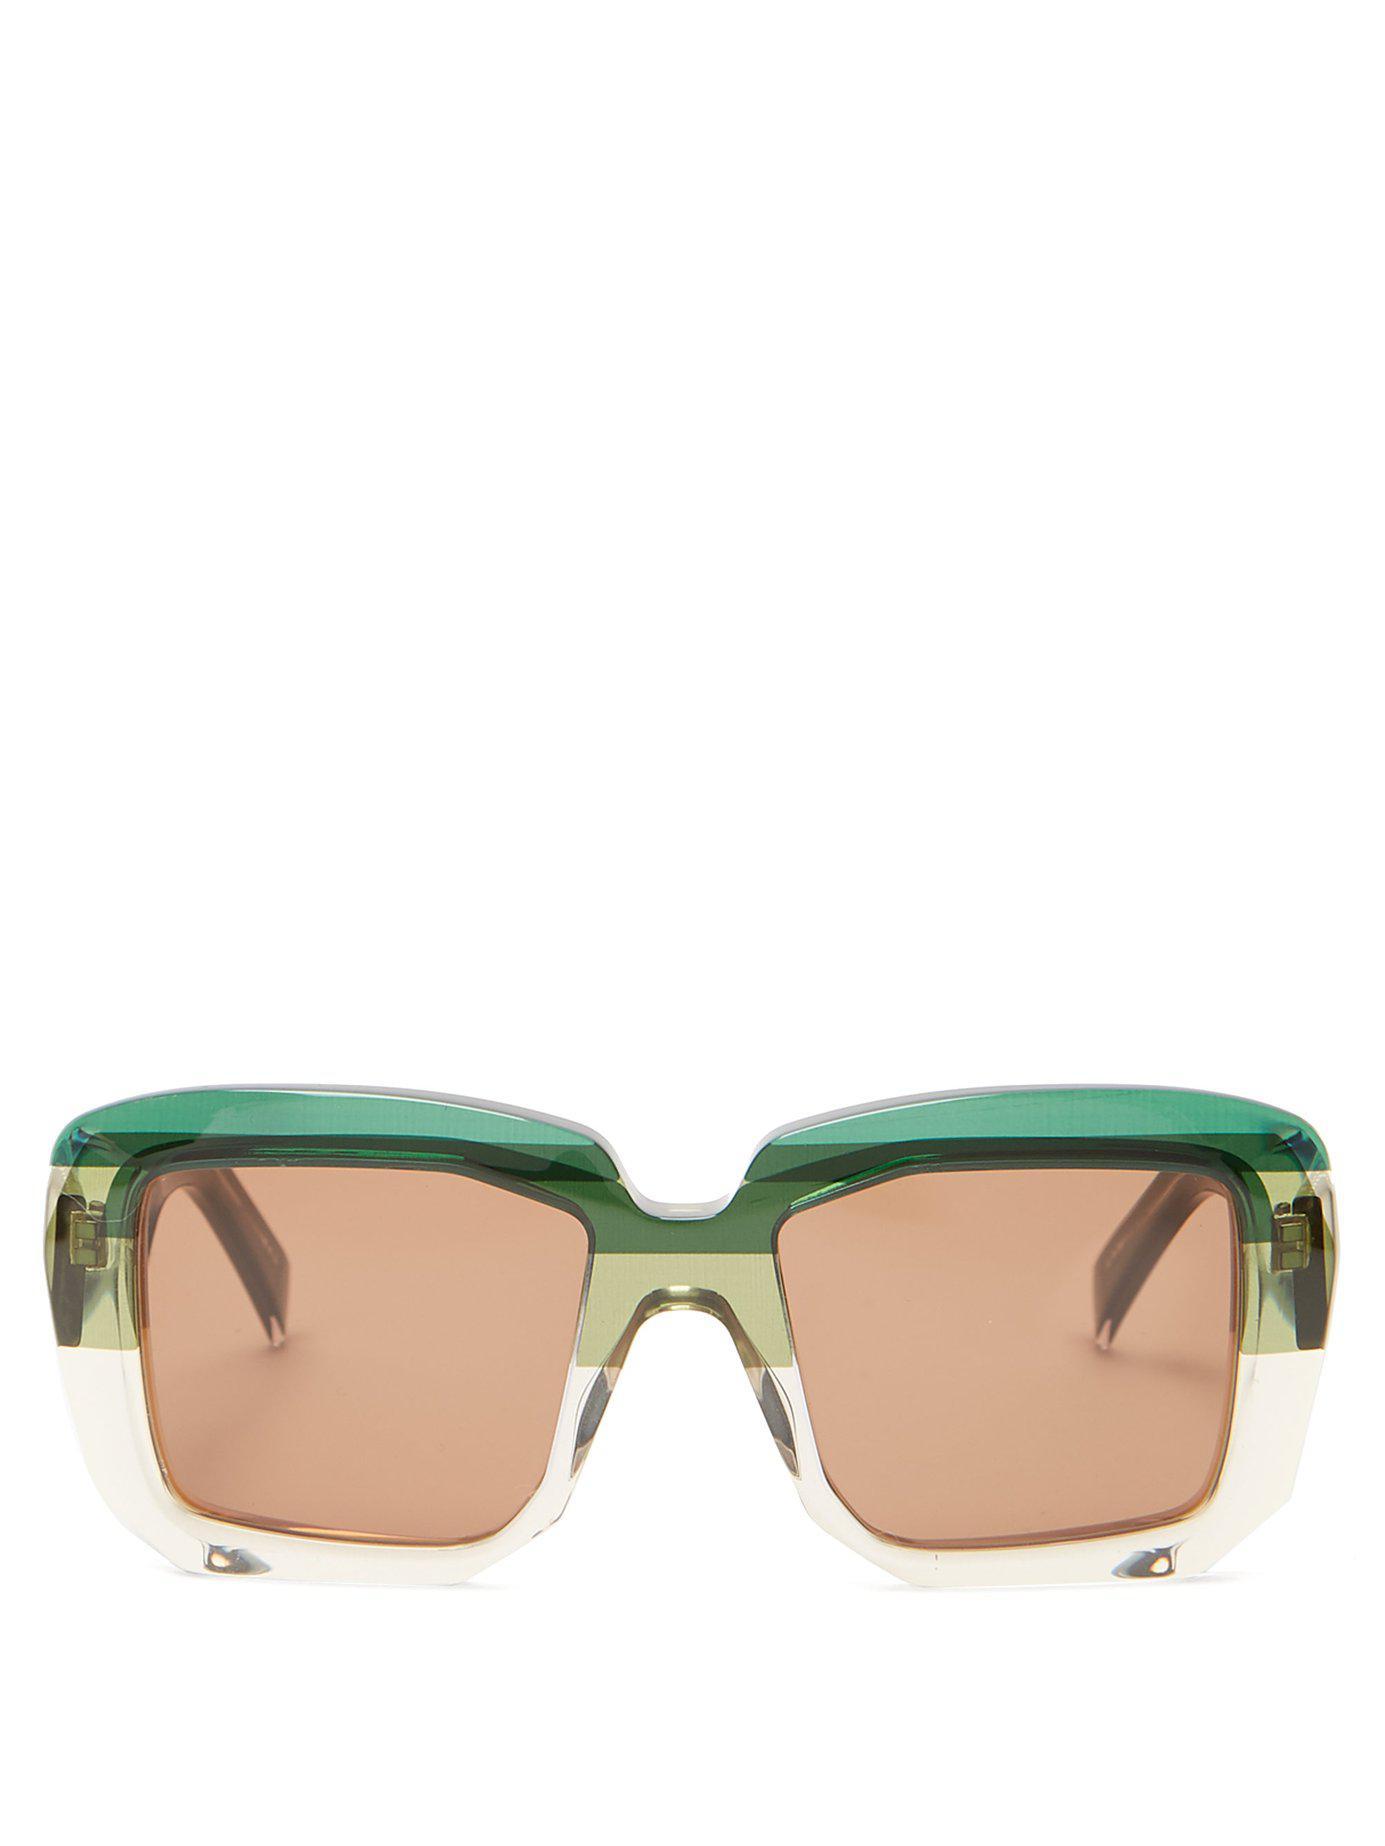 98e9deaa331 Lyst - Marni Rothko Square Acetate Sunglasses in Green